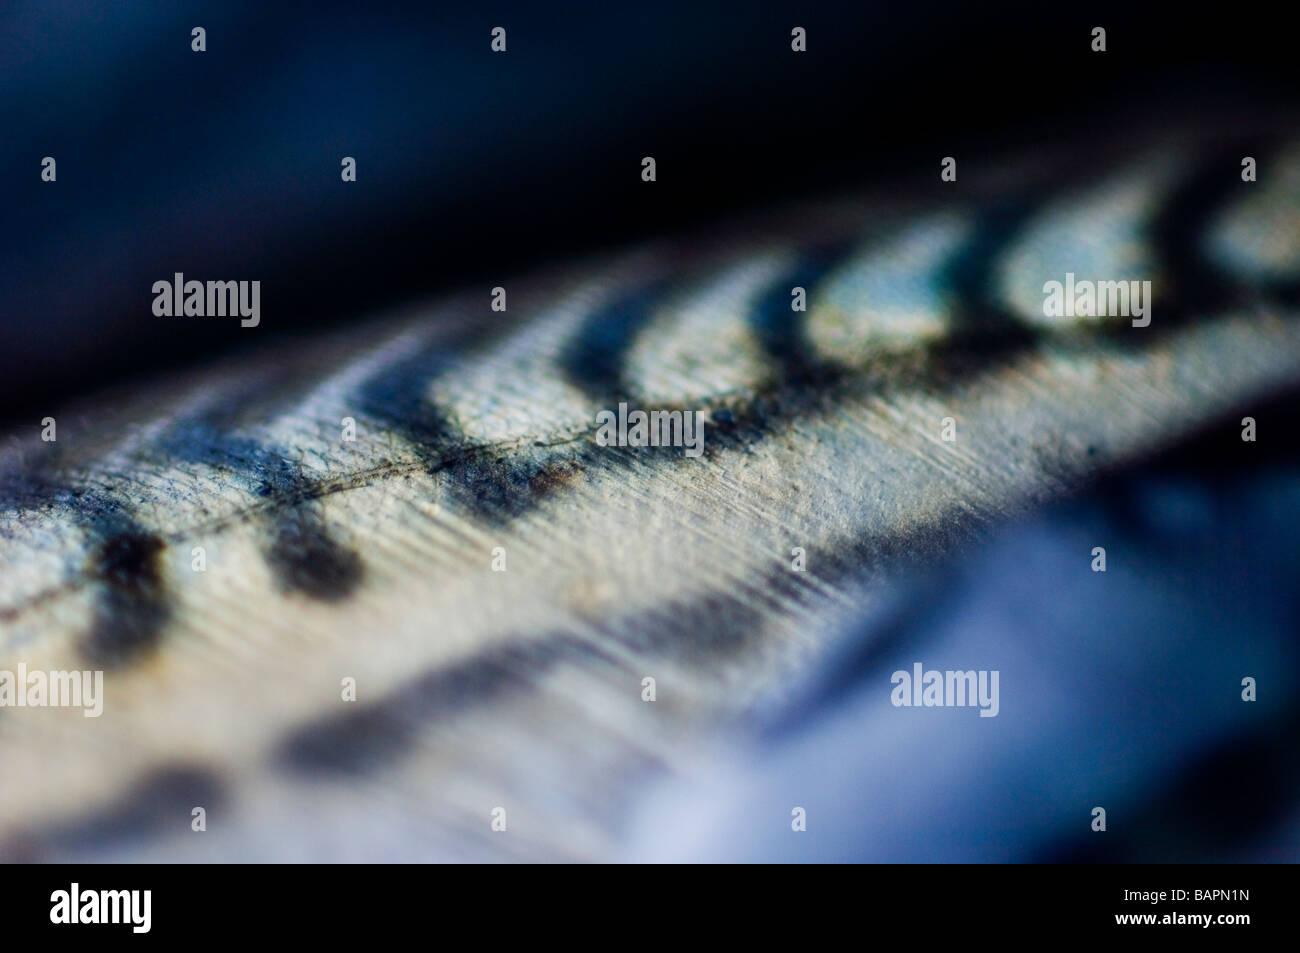 Scomber scombrus. Le maquereau balances, close-up, UK Photo Stock